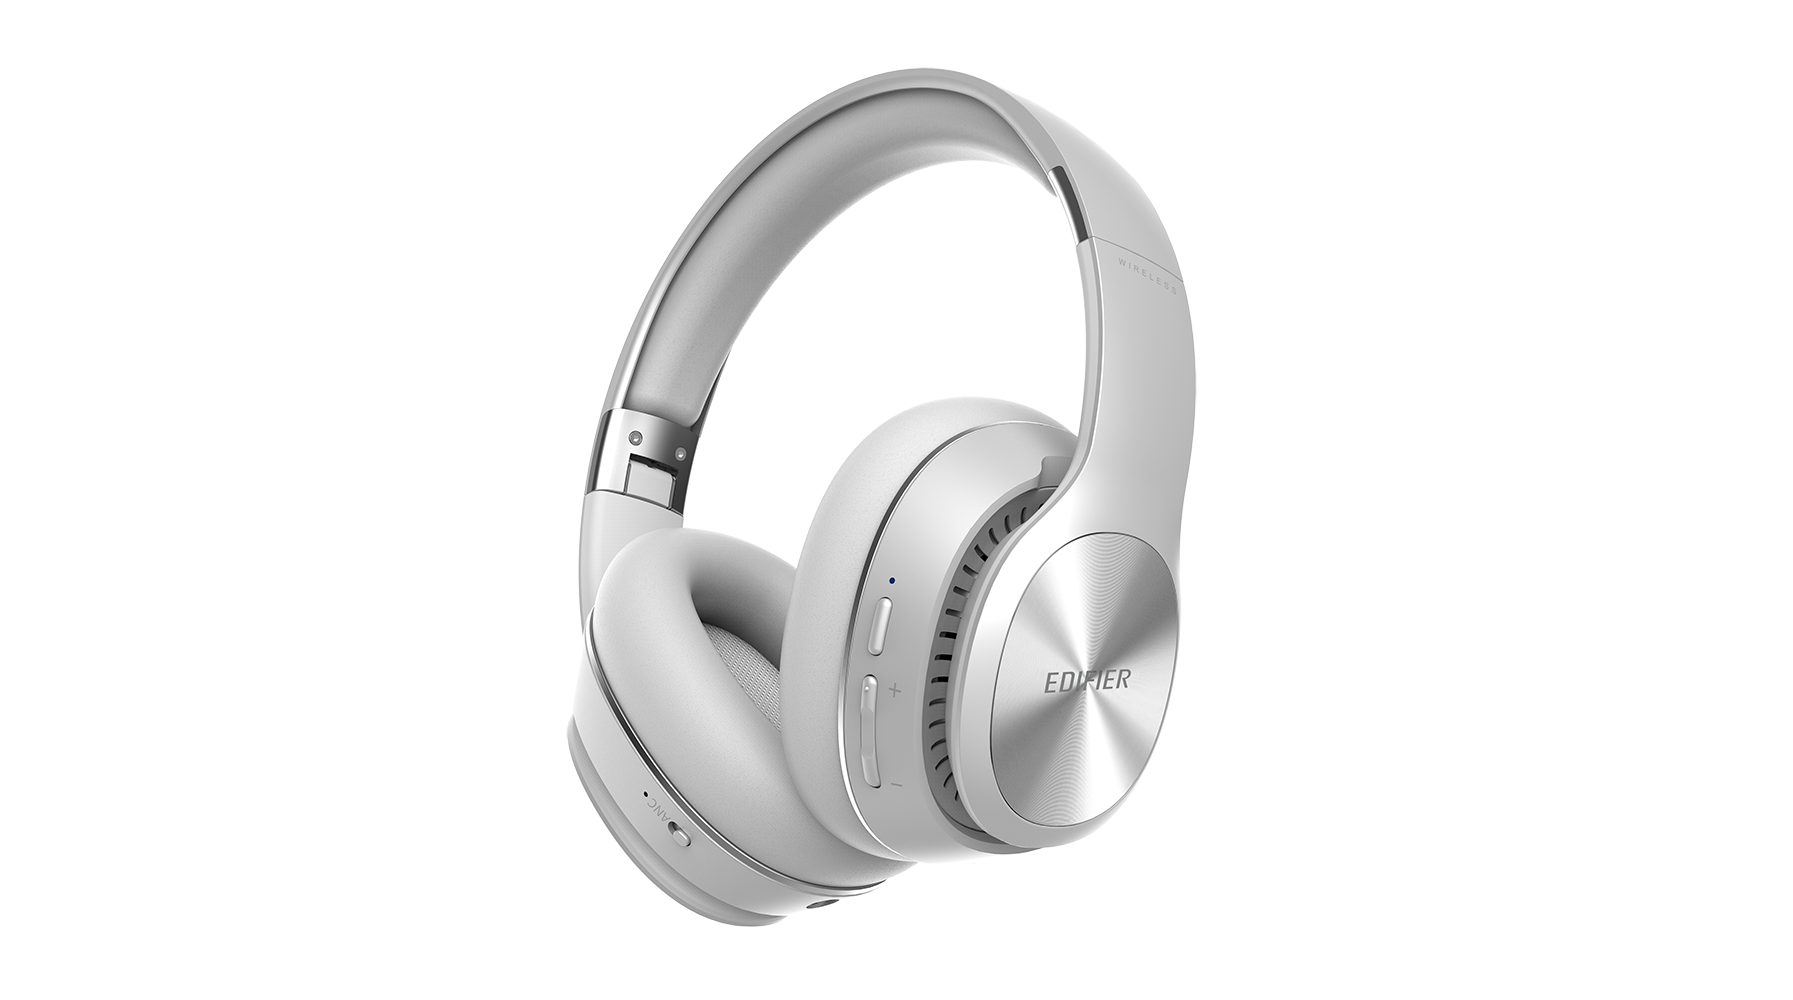 0c8cae6eabe Headphones and Earphones for Hi-Fi Music, Phones and Gaming ...